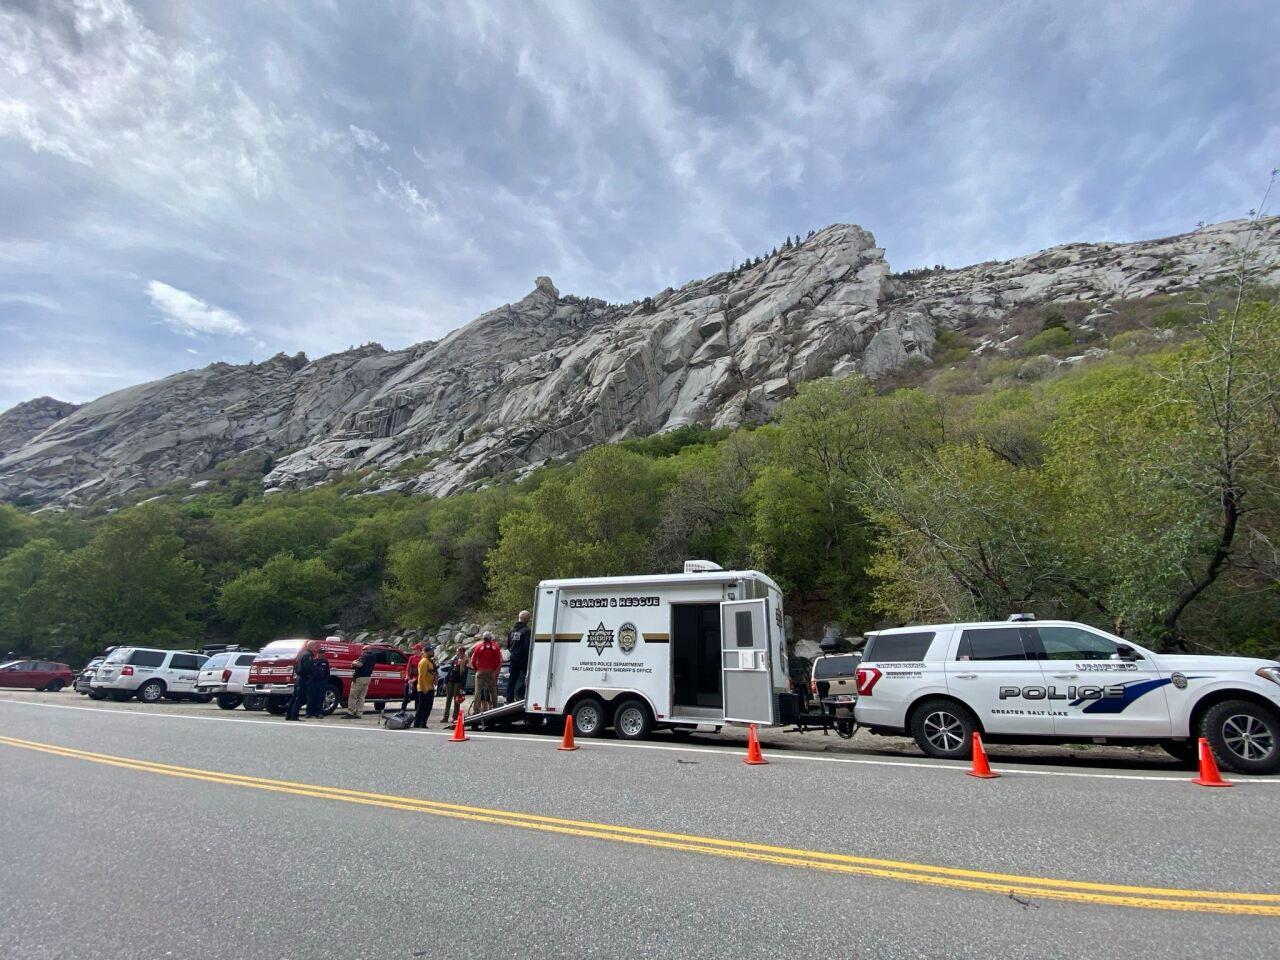 Salt Lake County climber rescue